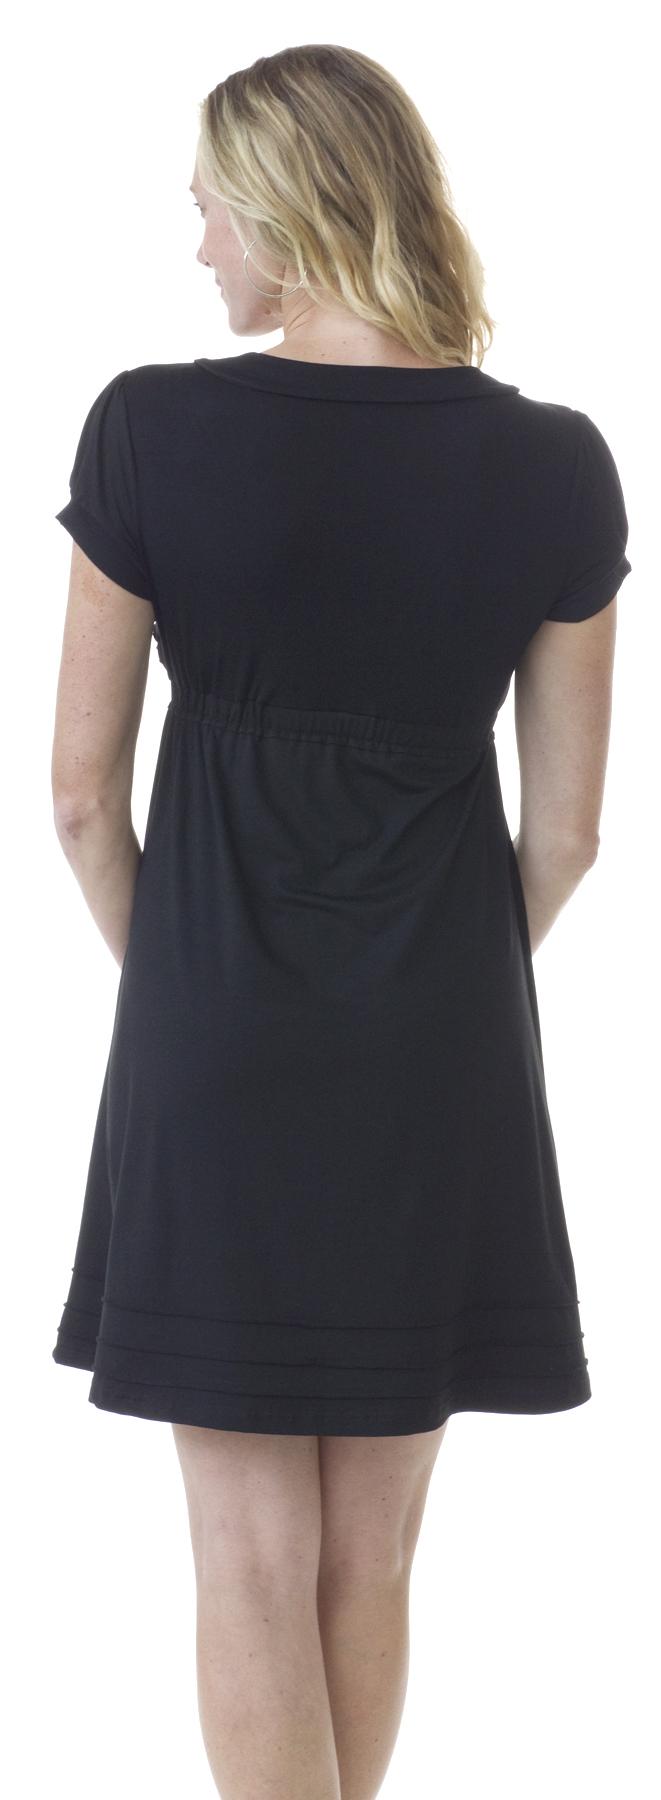 nixilu-coquette-nursing-dress-black-back.jpg